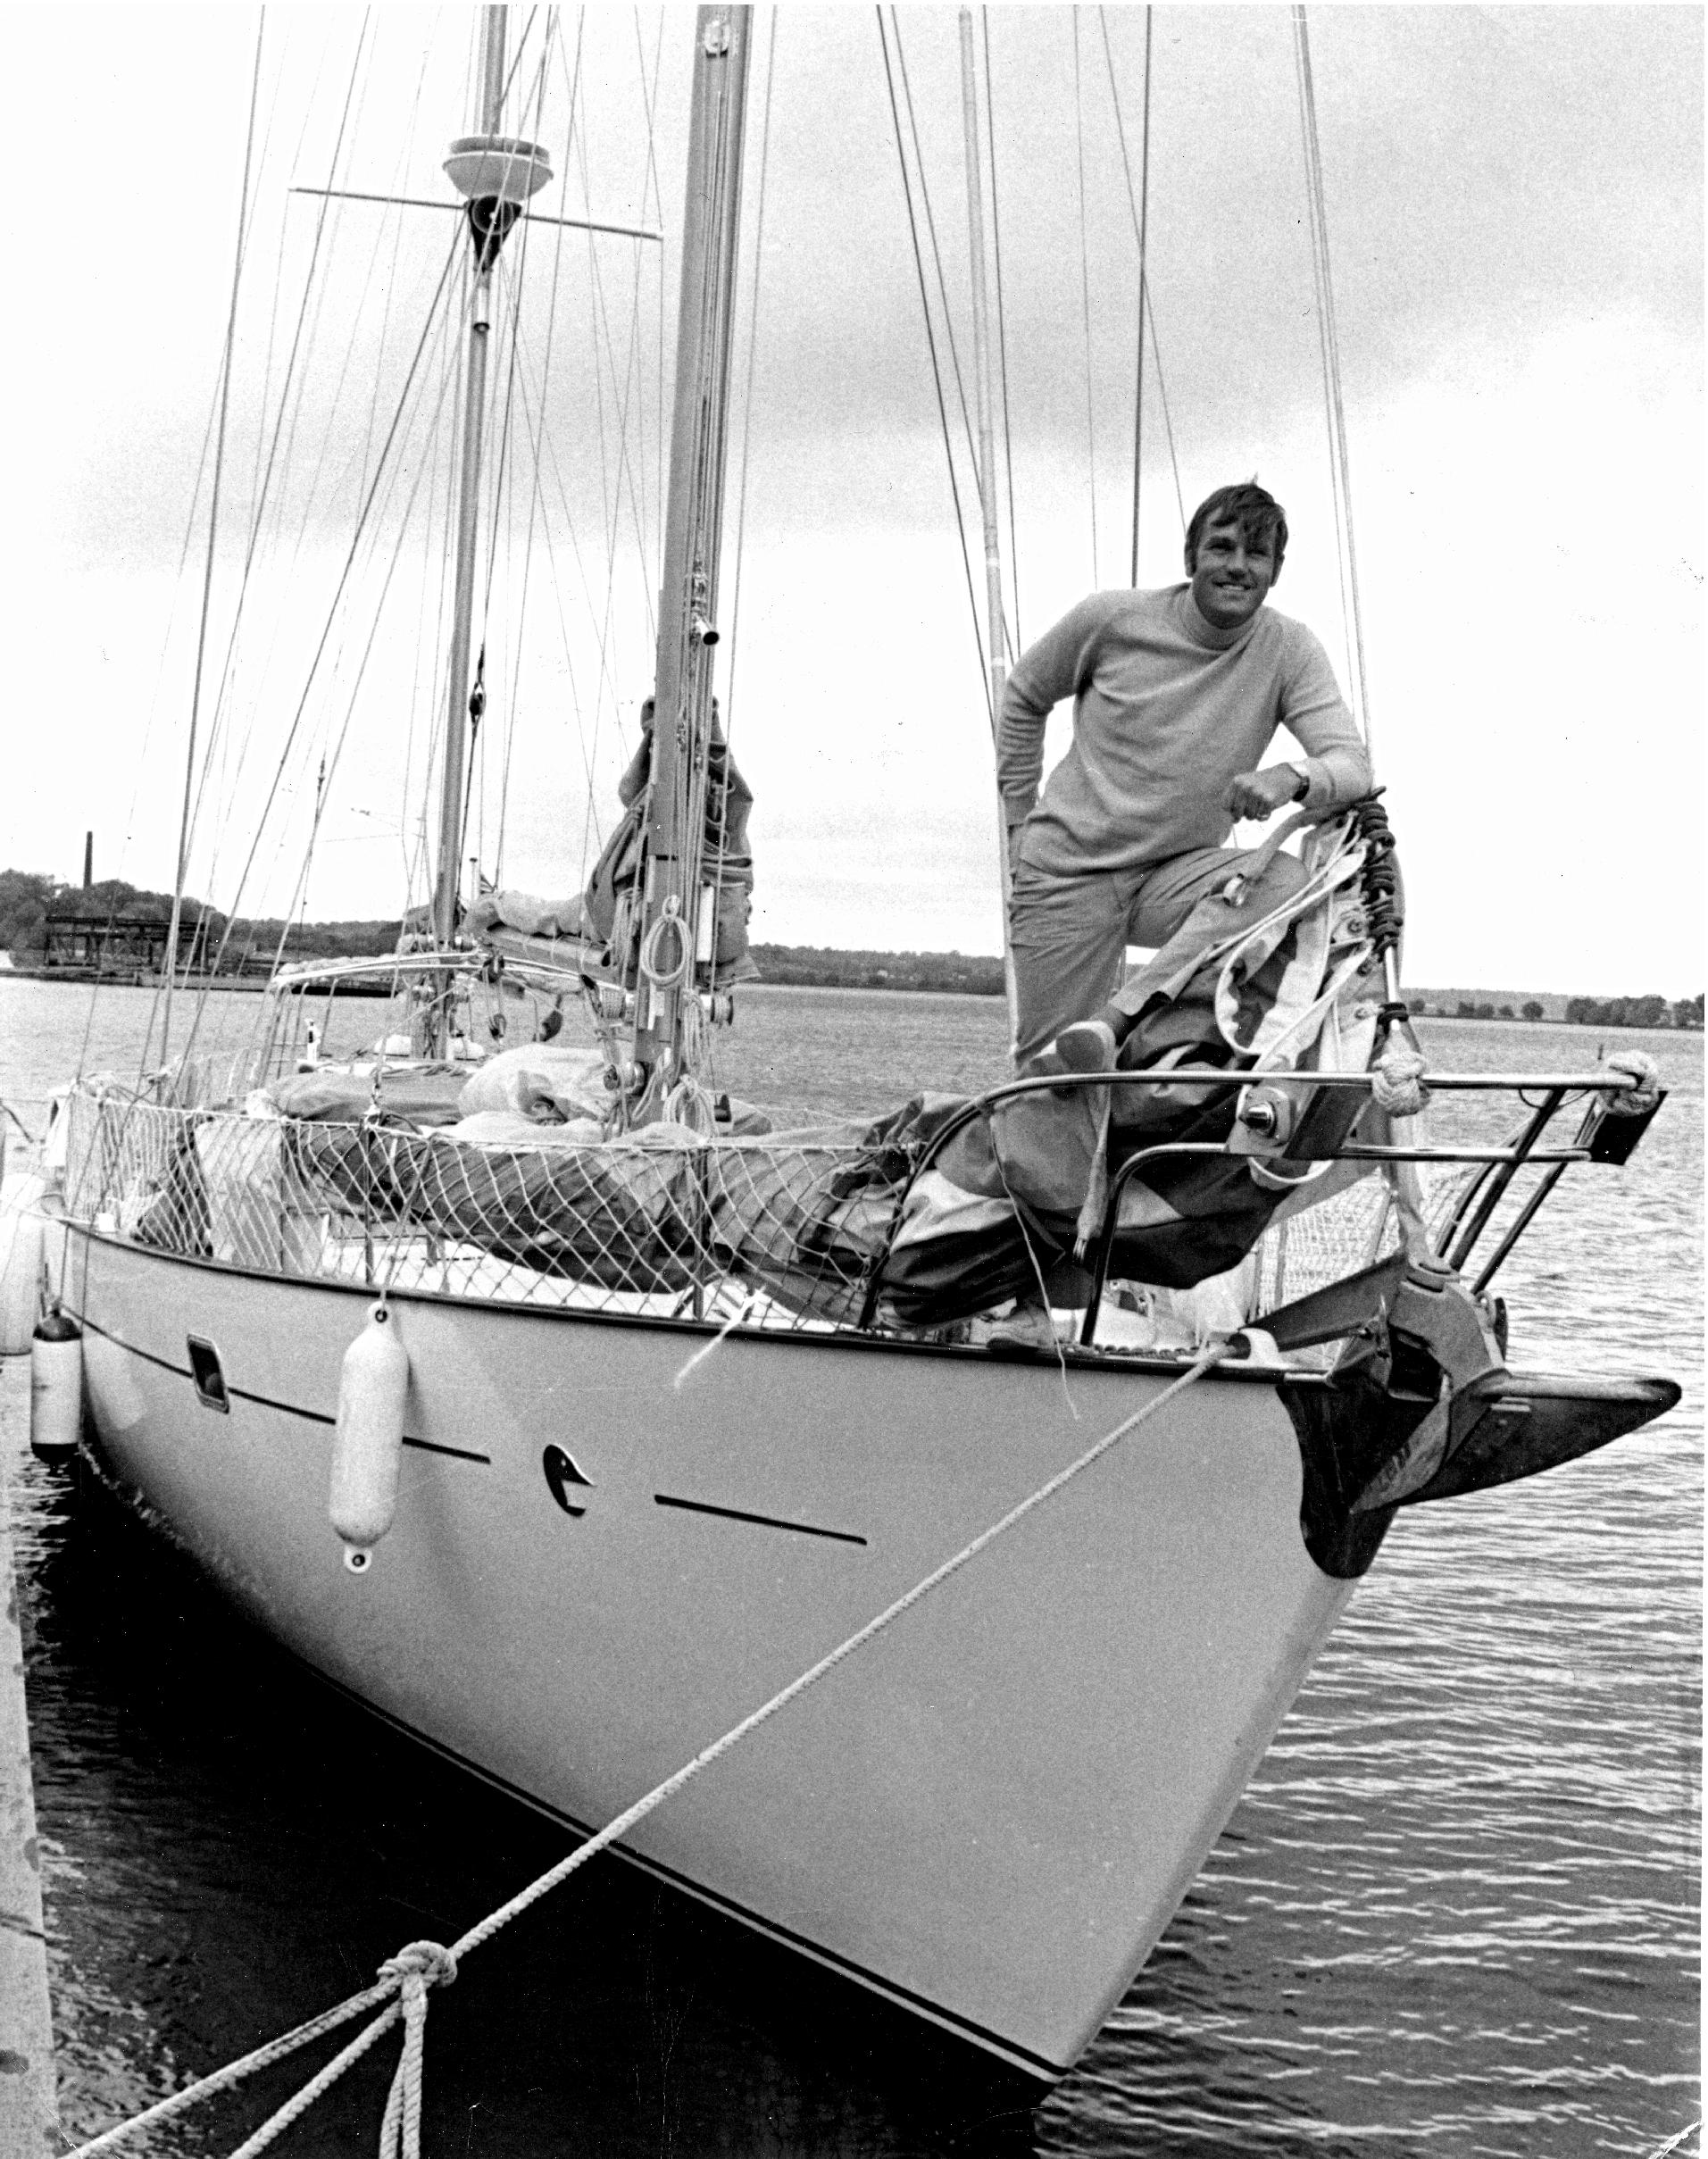 Graham-on-Boat_Treena-SMALL.jpg